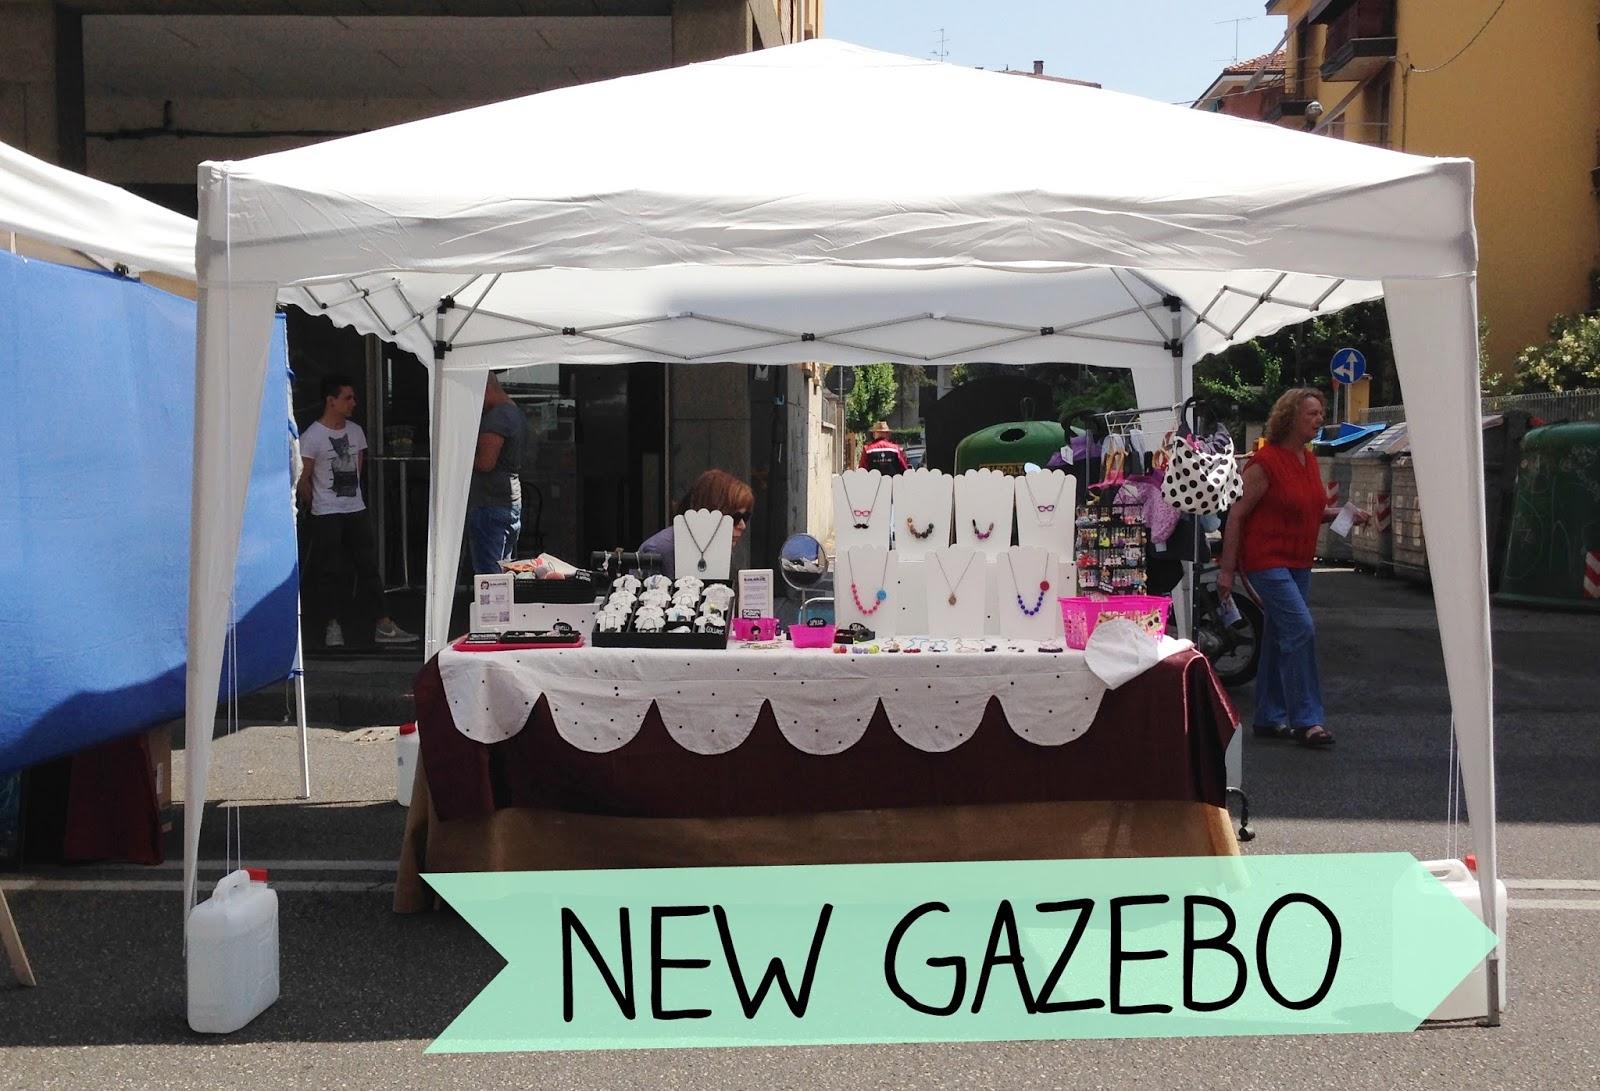 Allestimento Gazebo Matrimonio all' Aperto | Floral Eventi